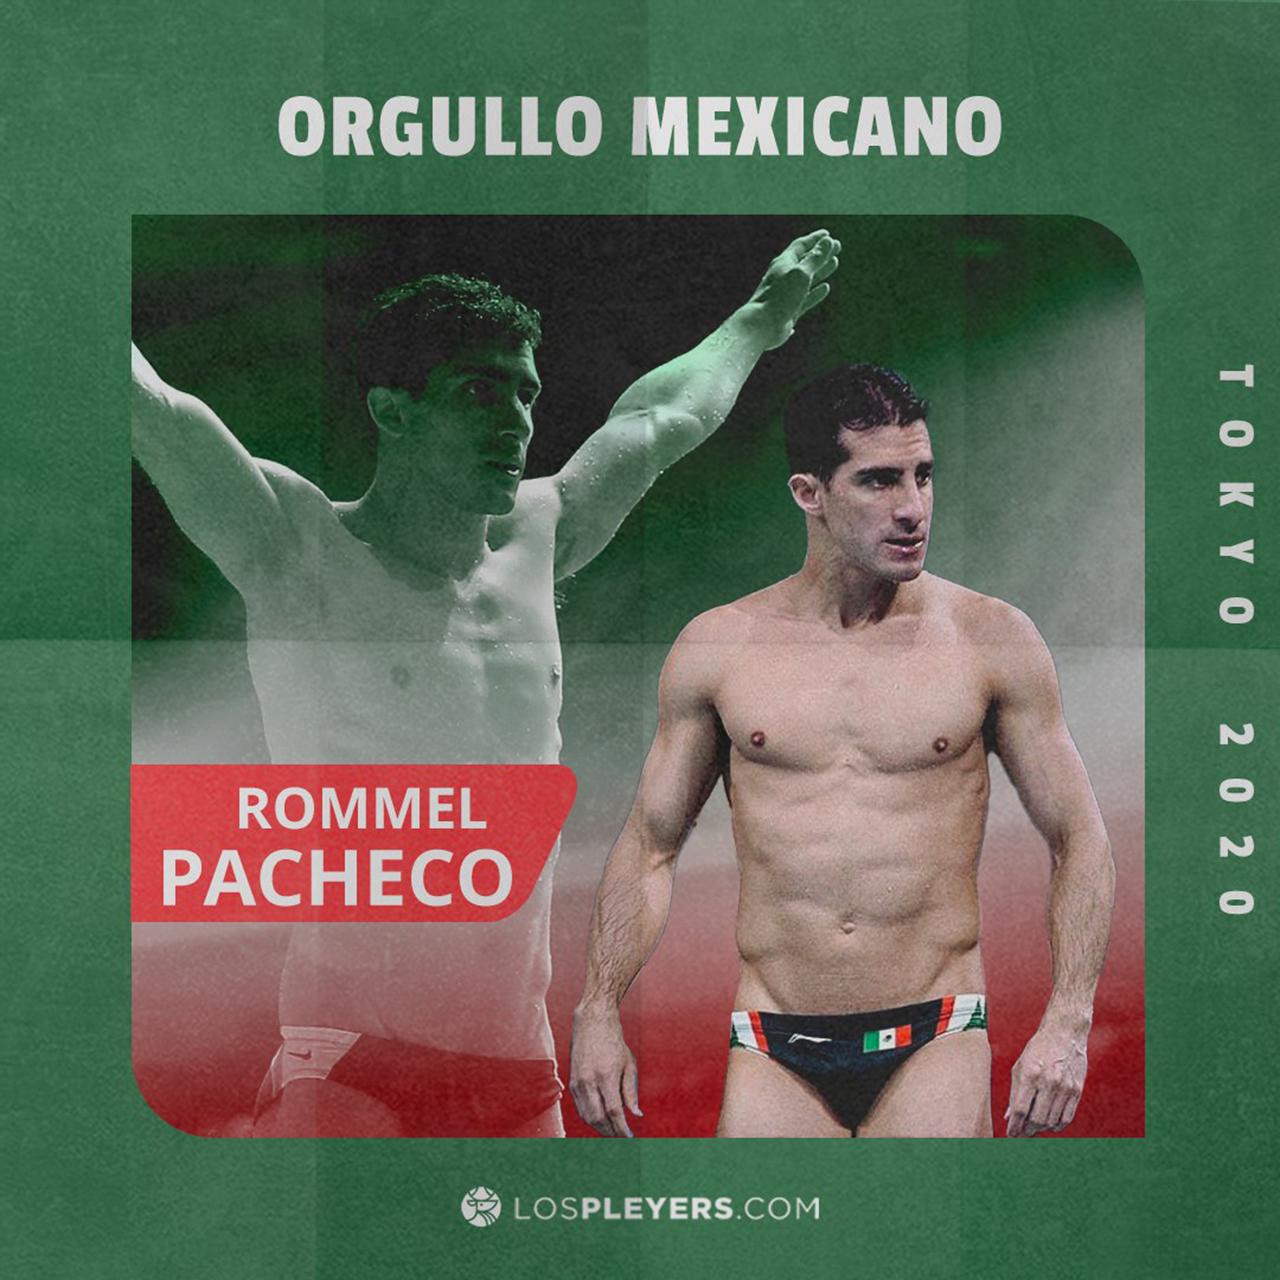 Rommel Pacheco Final trampolin Tokyo 2020 resultado